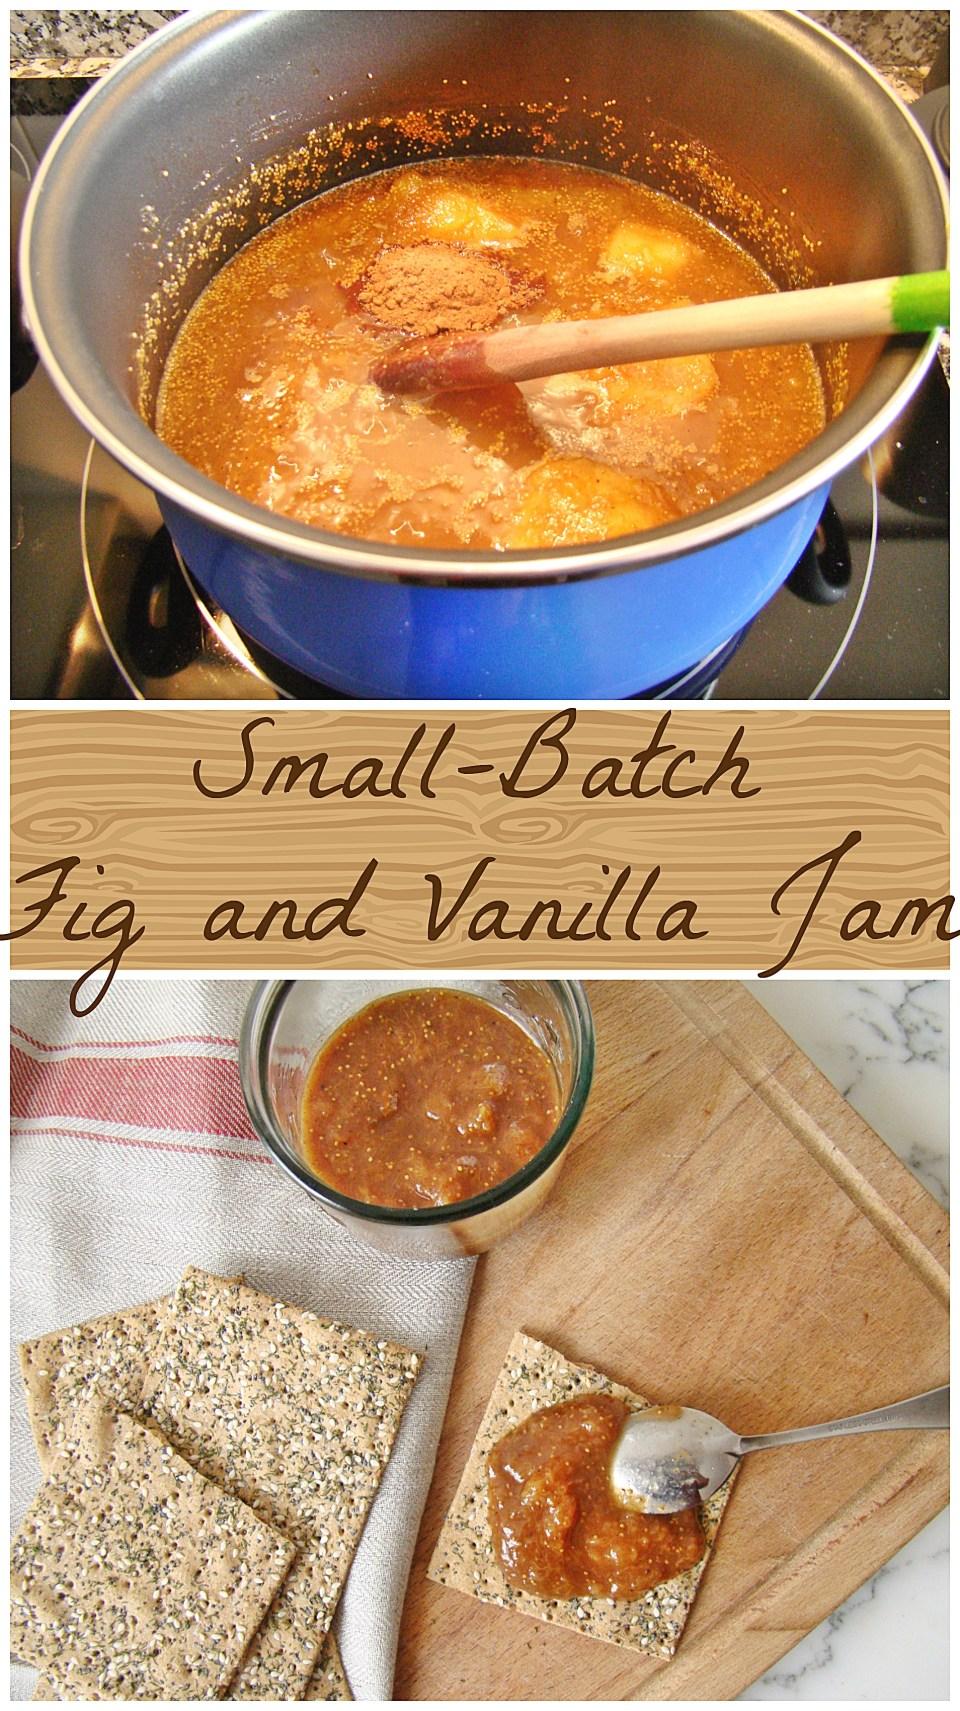 small-batch-fig-and-vanilla-jam